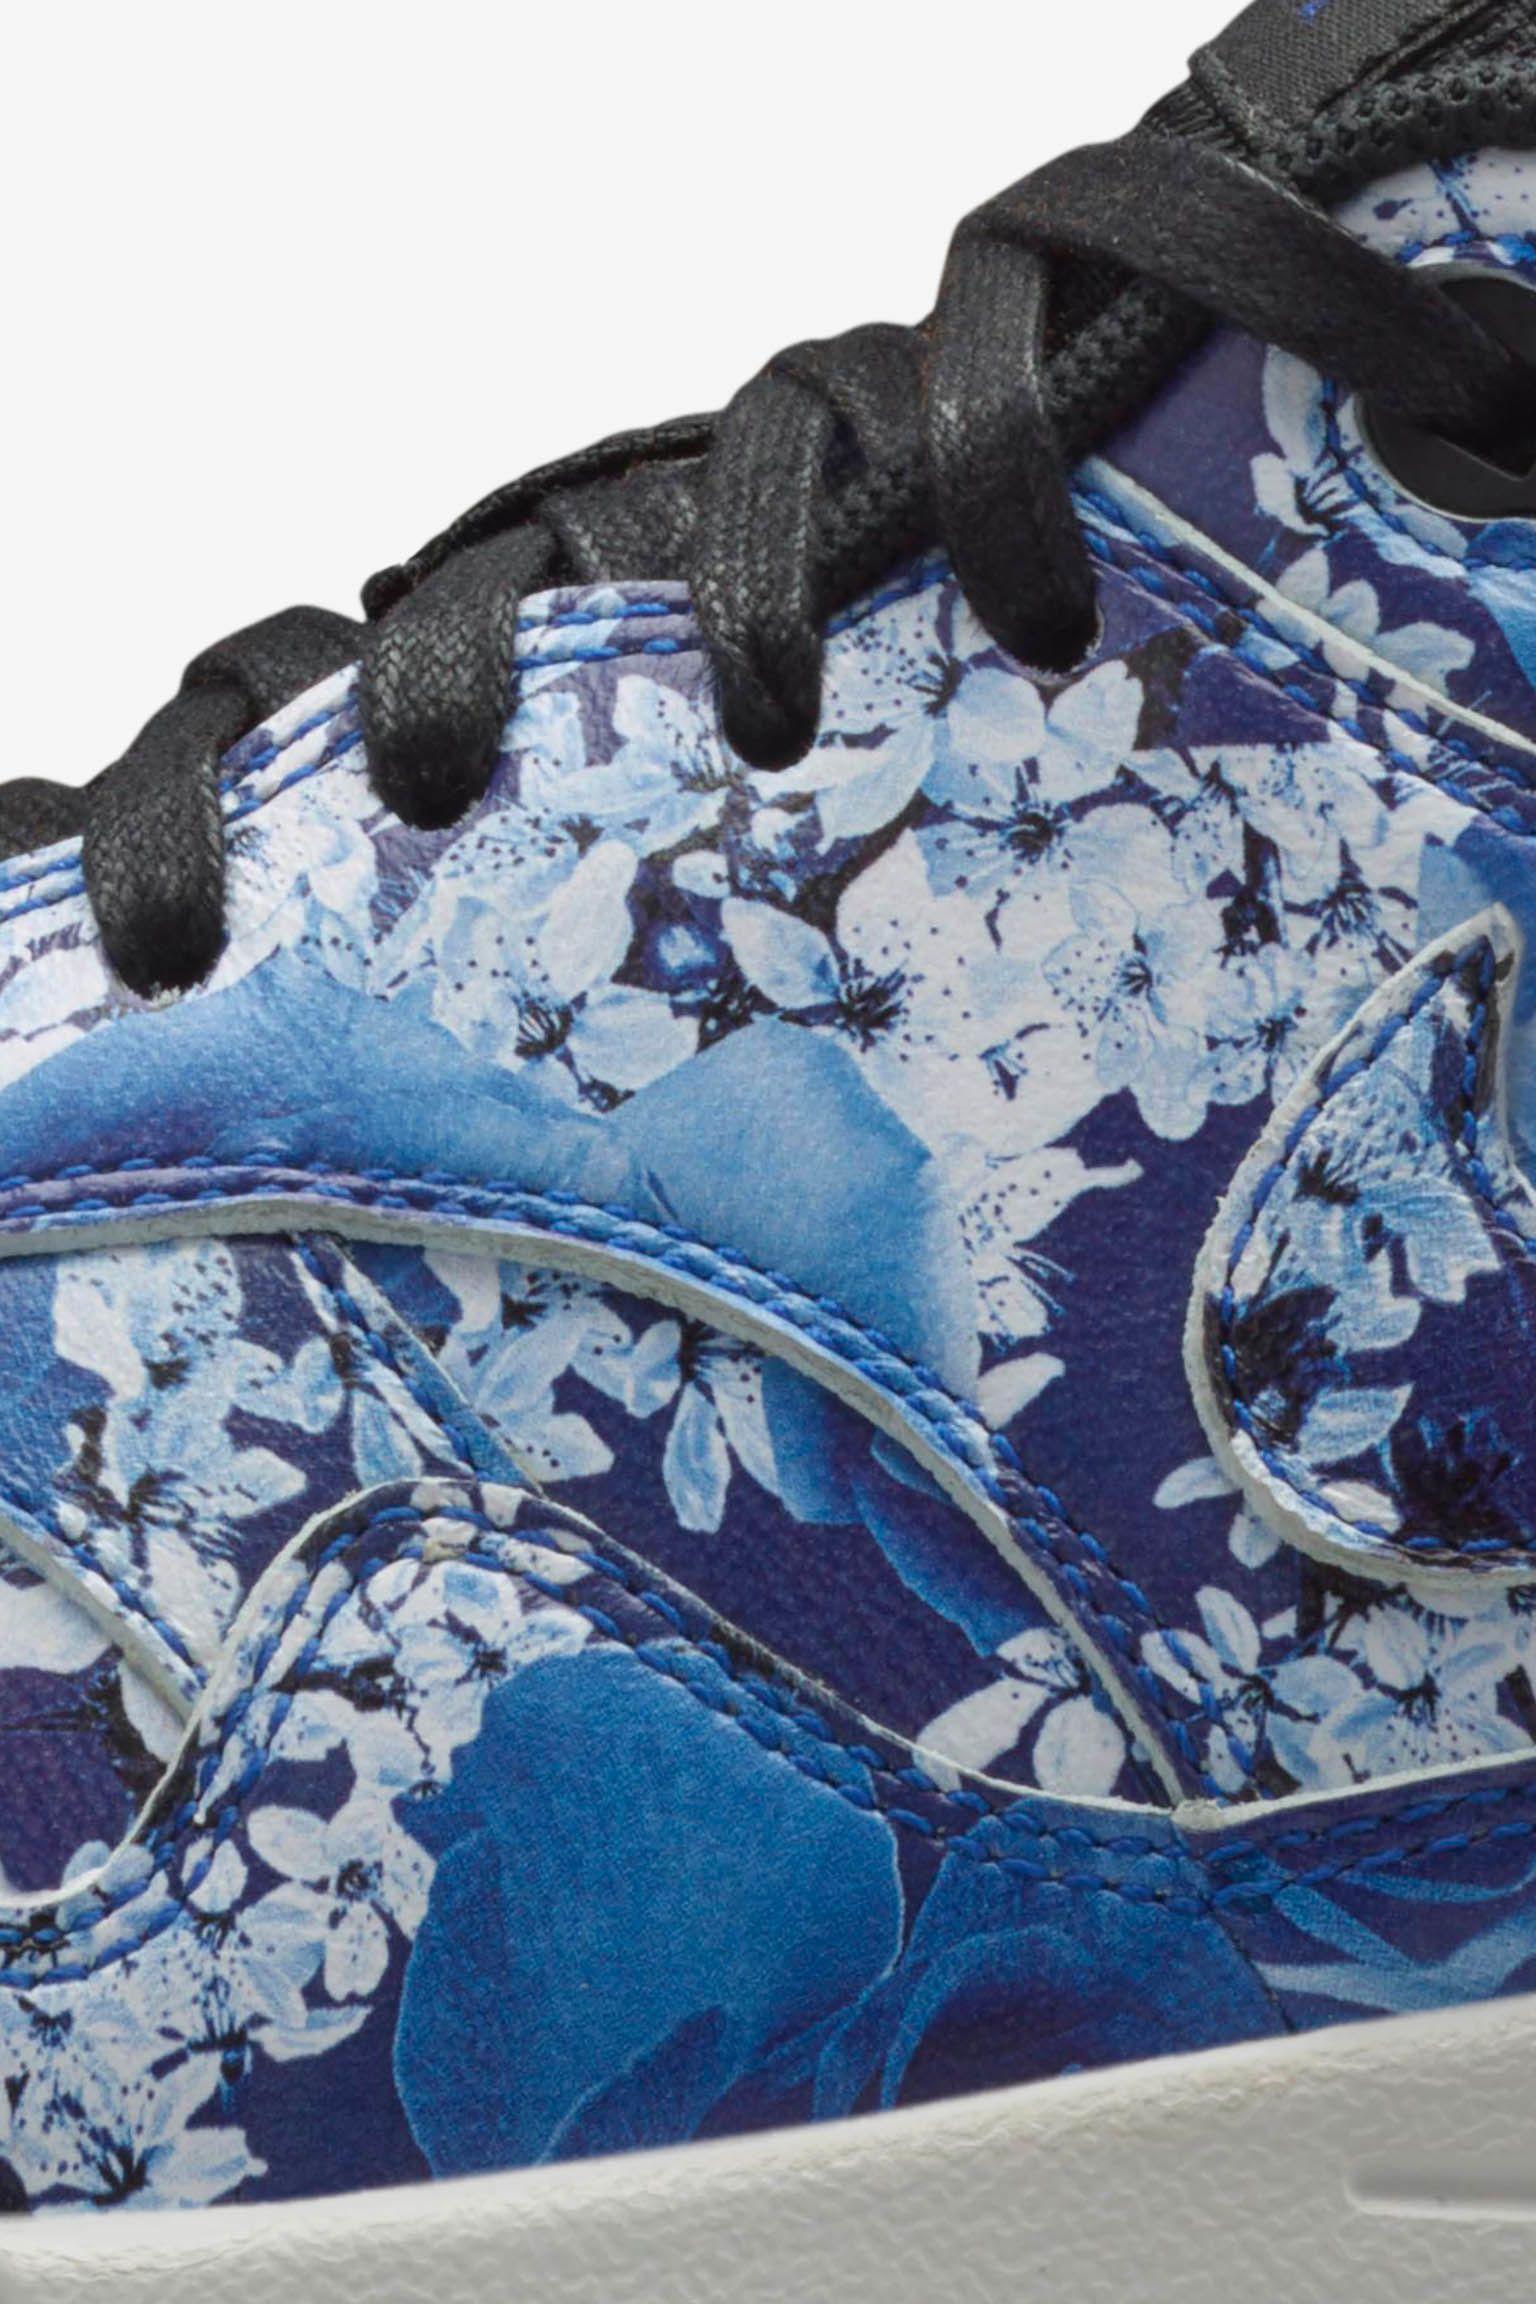 Dámská bota Nike Air Max 1 Ultra Moire 'Tokyo'